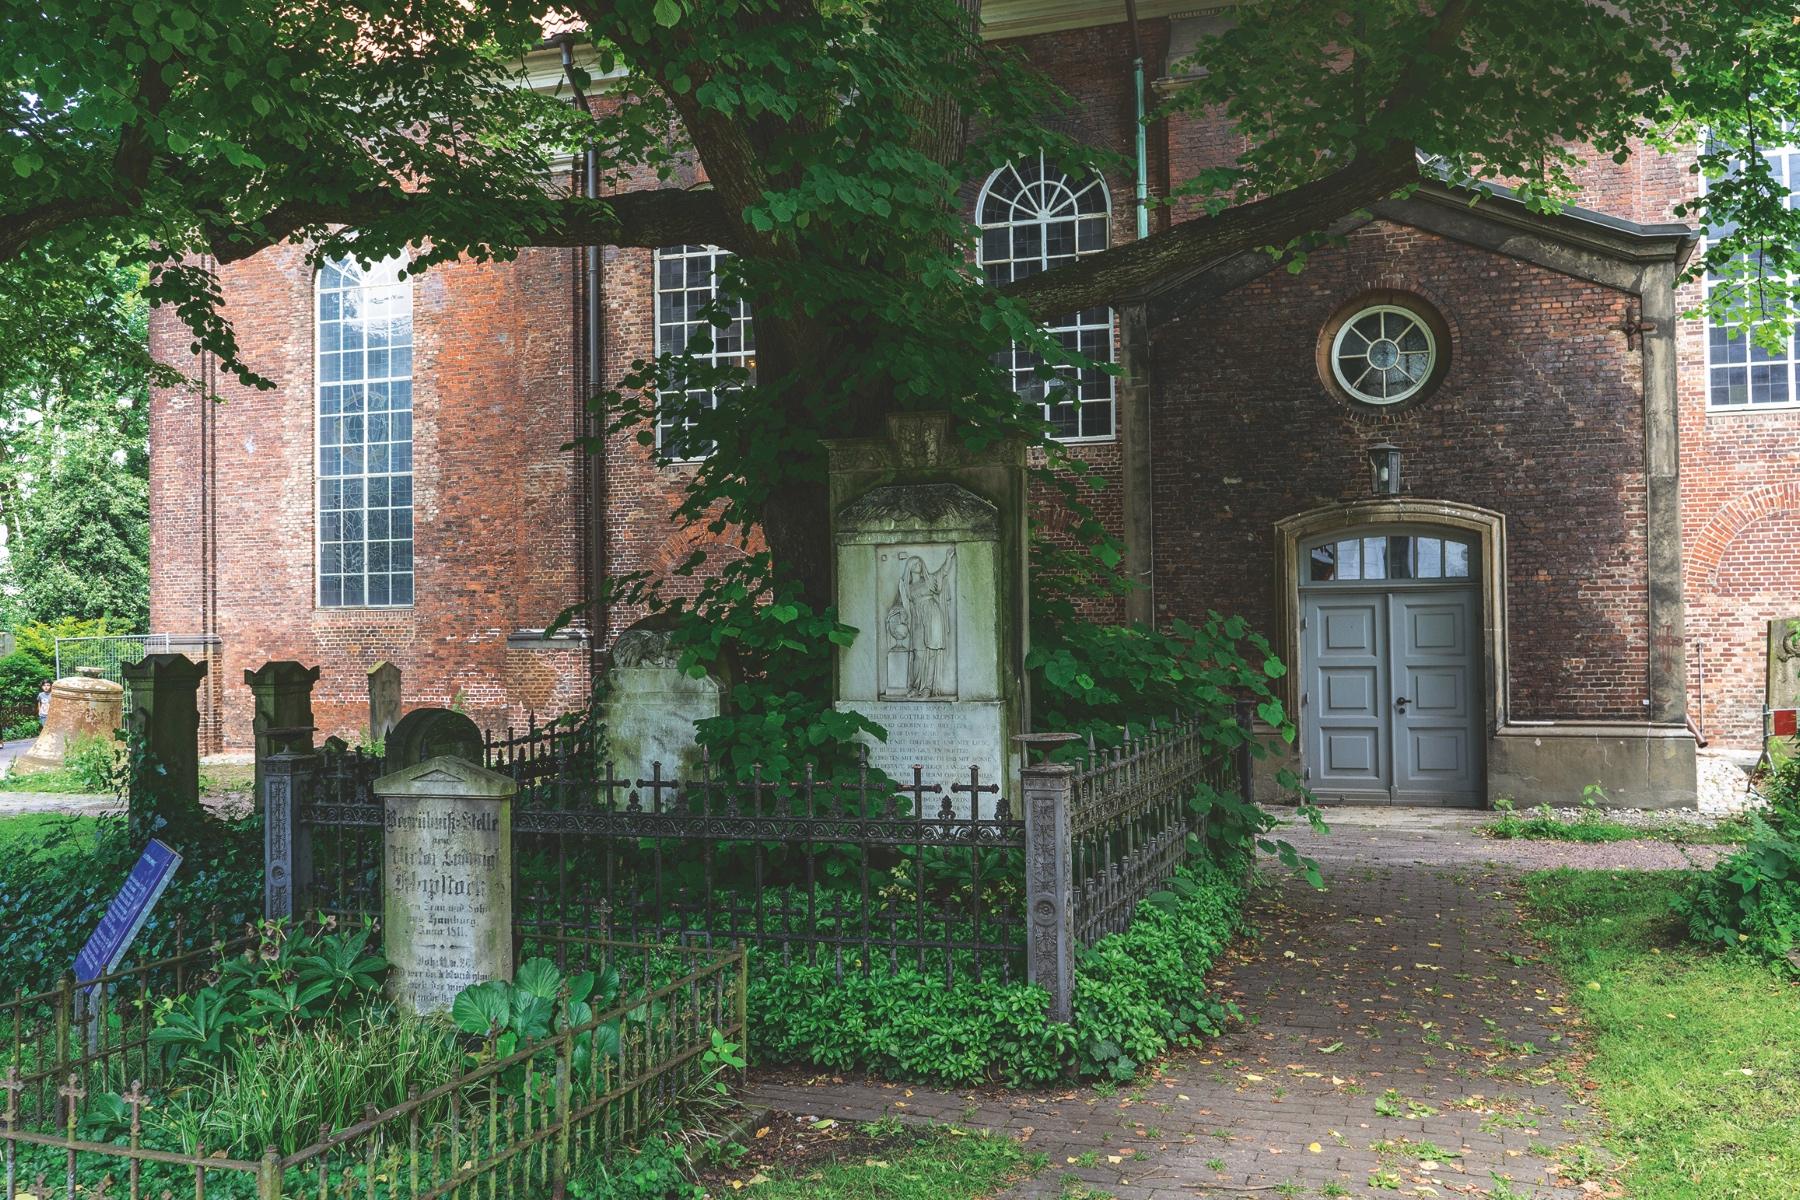 Geheimtipp Hamburg Ottensen Hometown History Altona SHMH 05 – ©SHMH